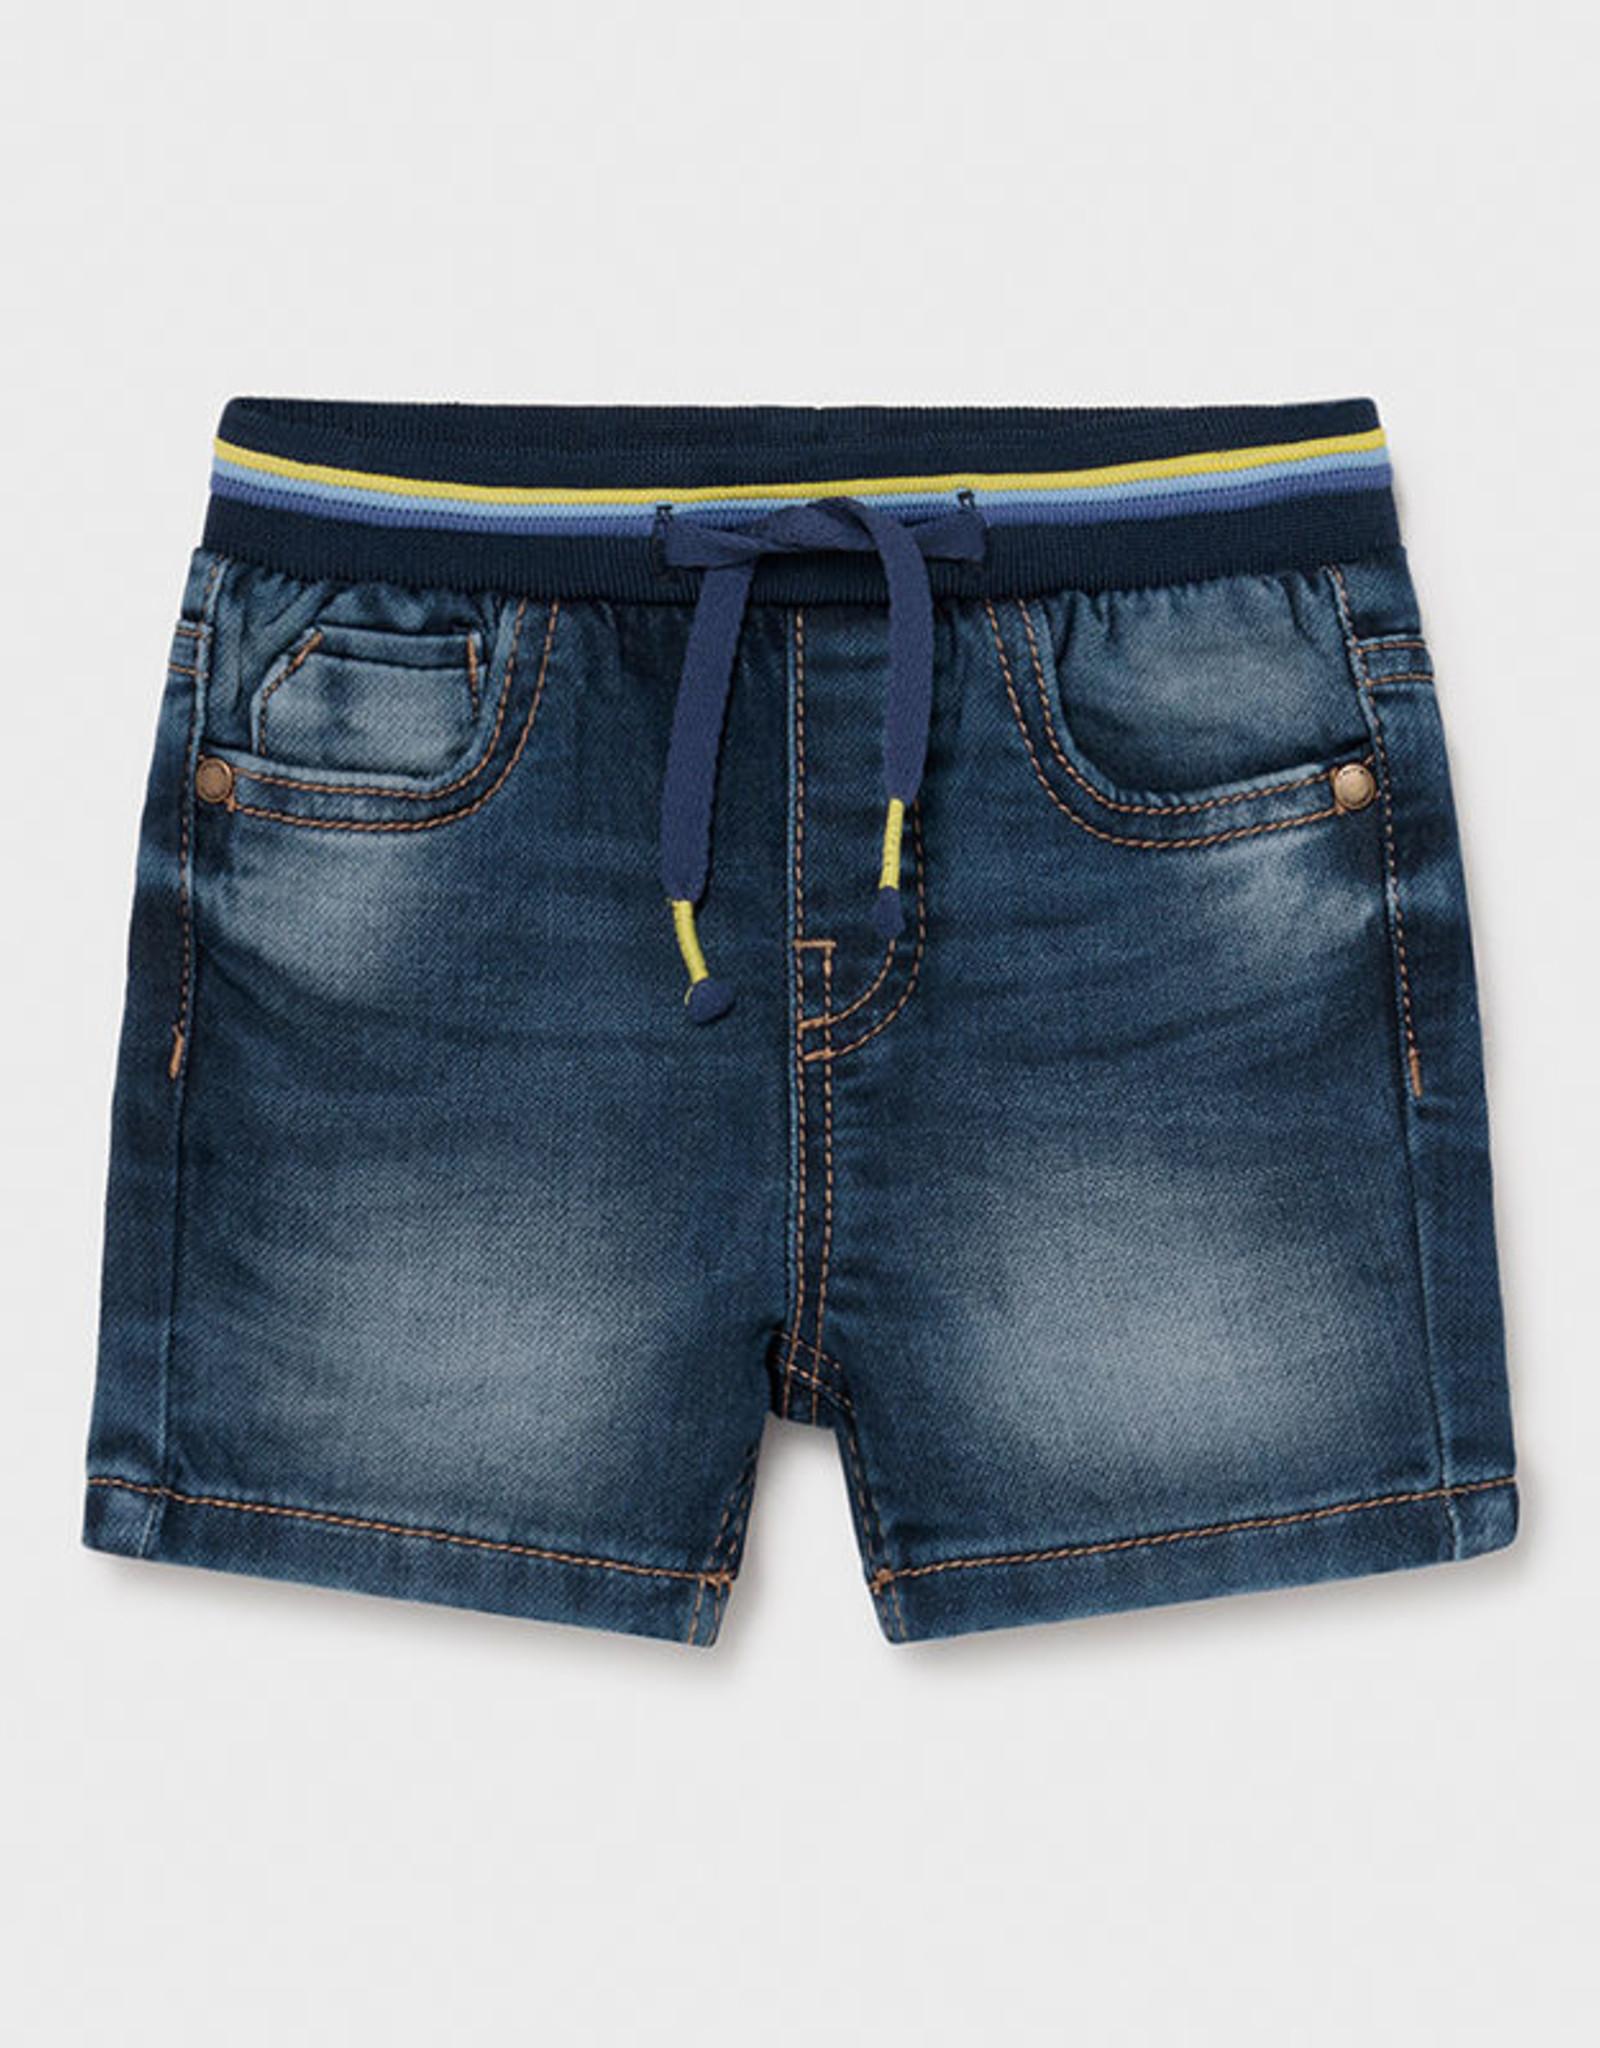 Mayoral SP21 BbyB Denim Shorts